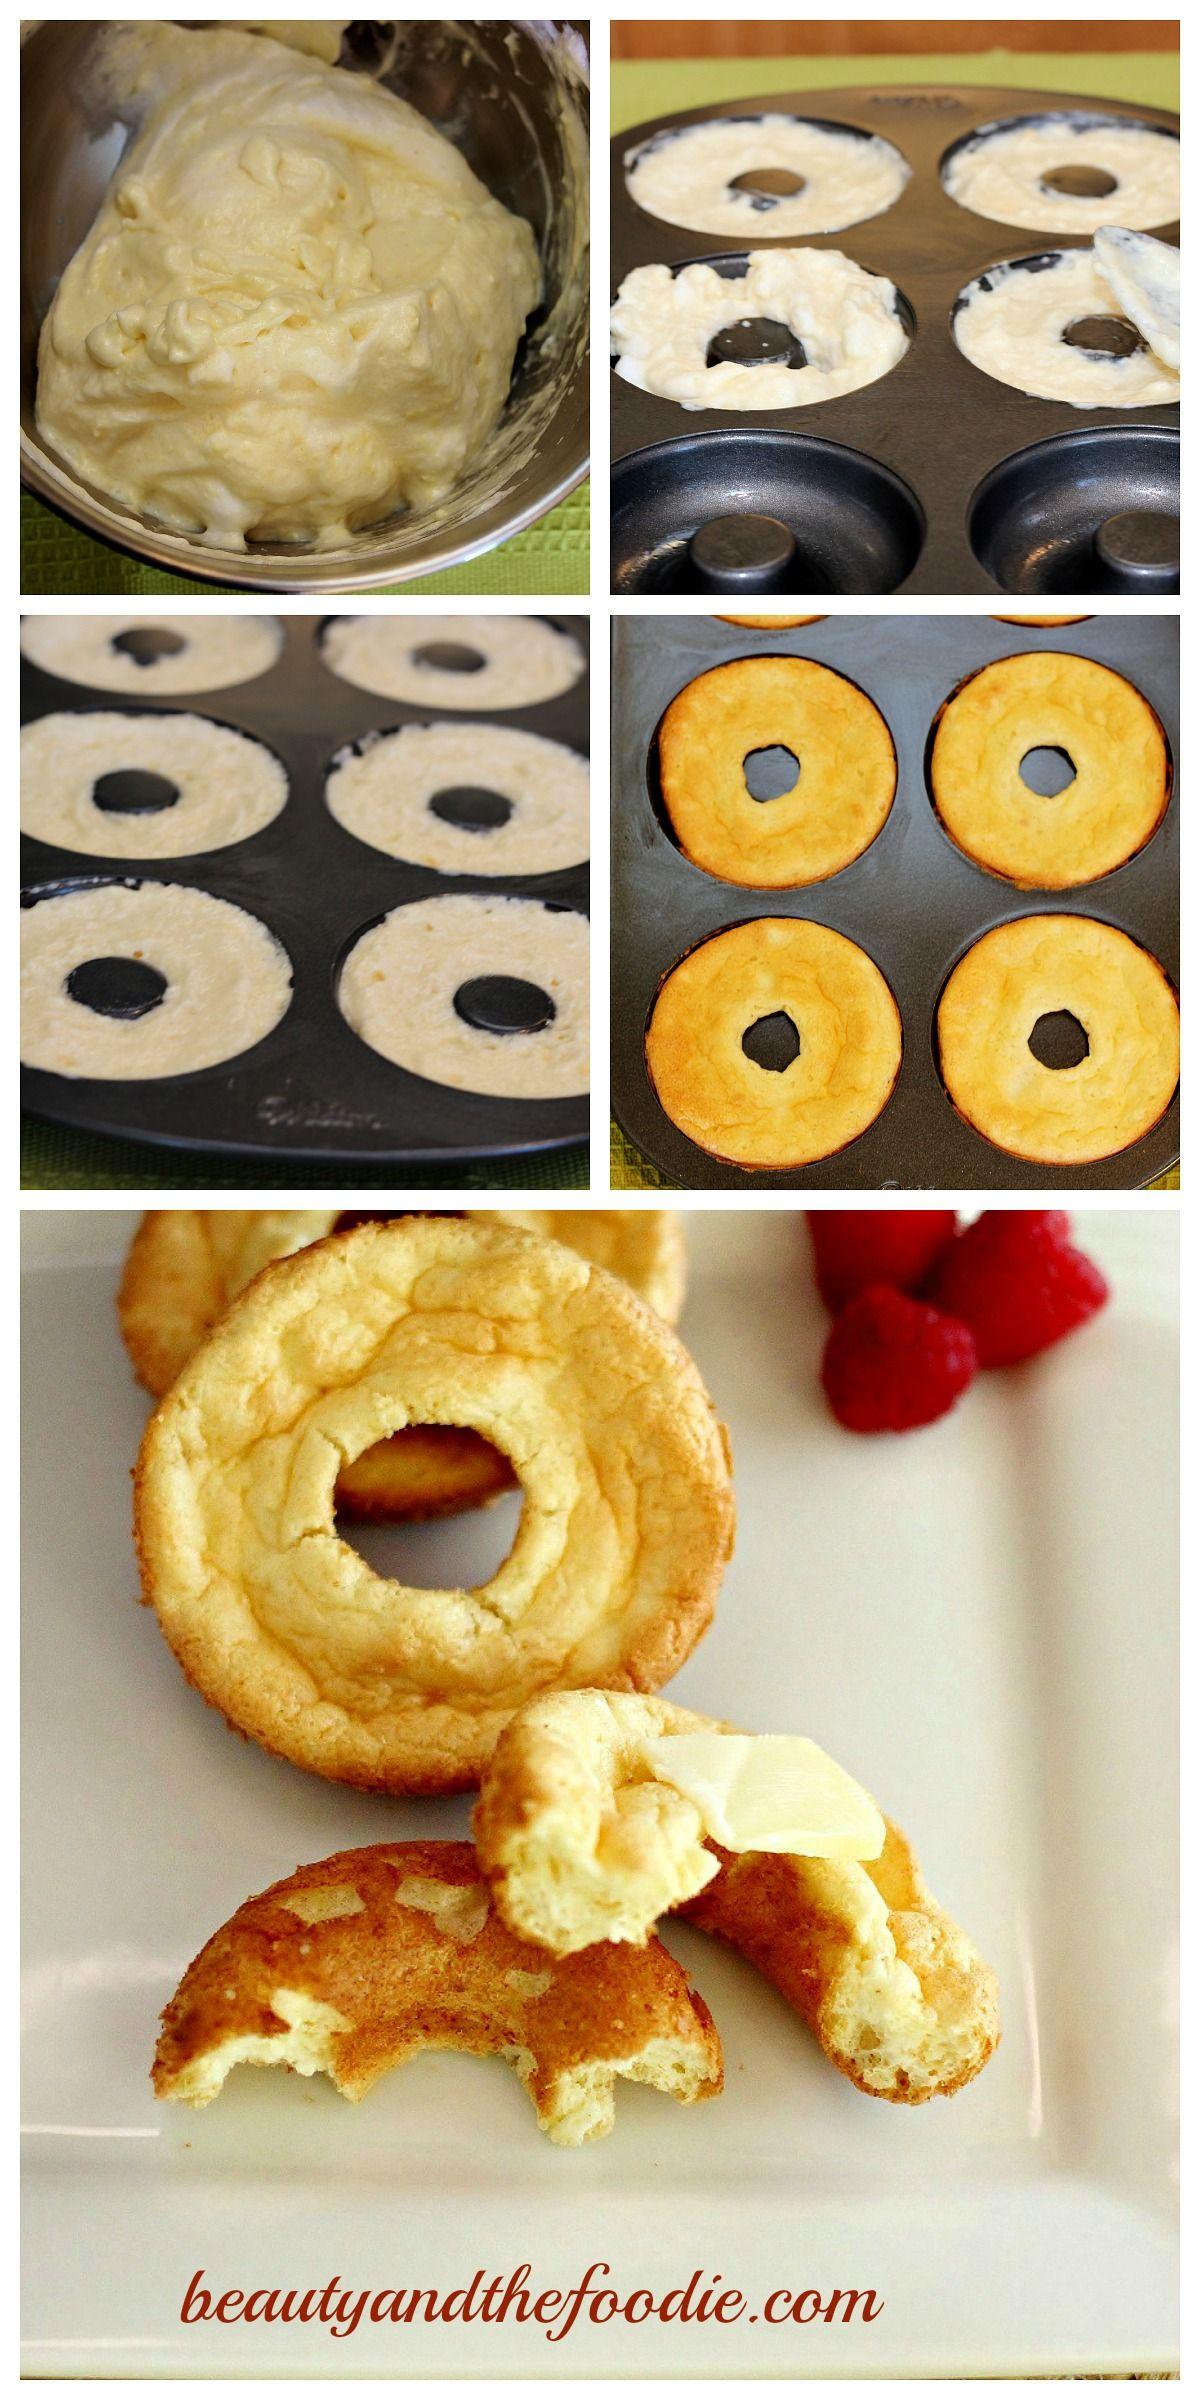 glutenfri croissant recept